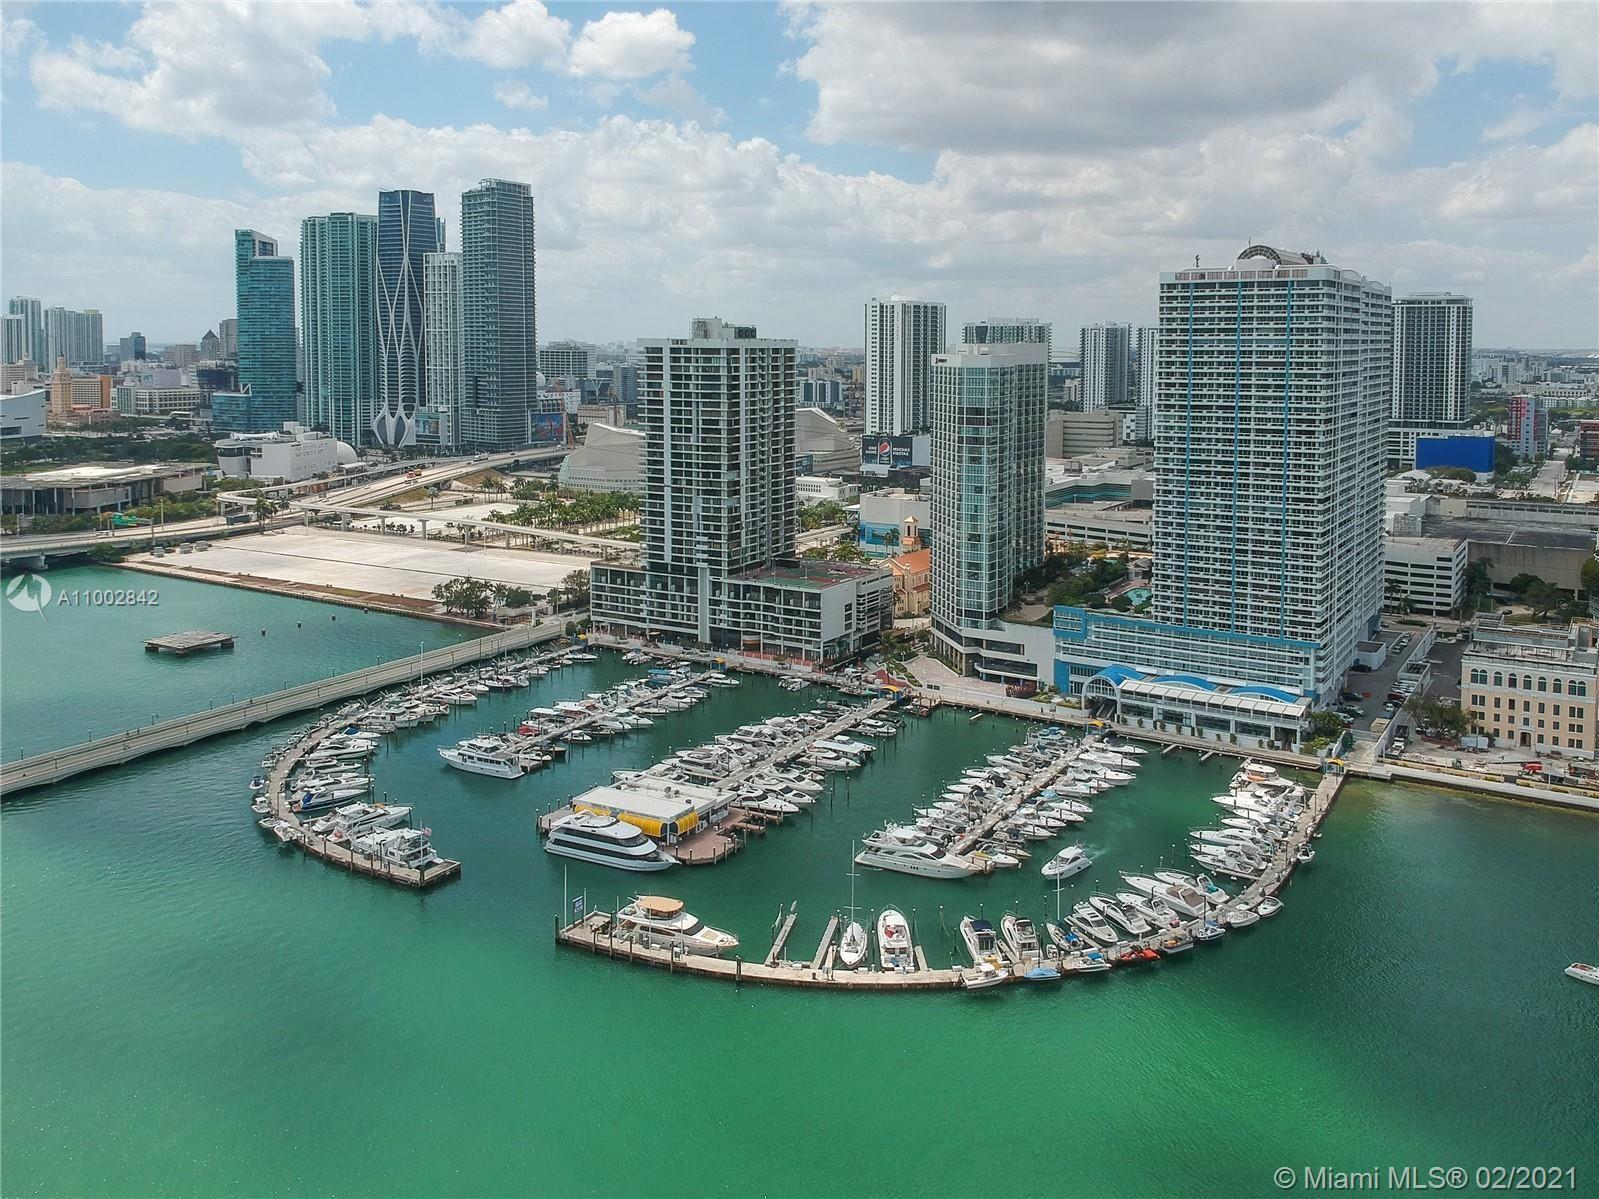 1717 N Bayshore Dr #A-1947, Miami, FL 33132 - #: A11002842